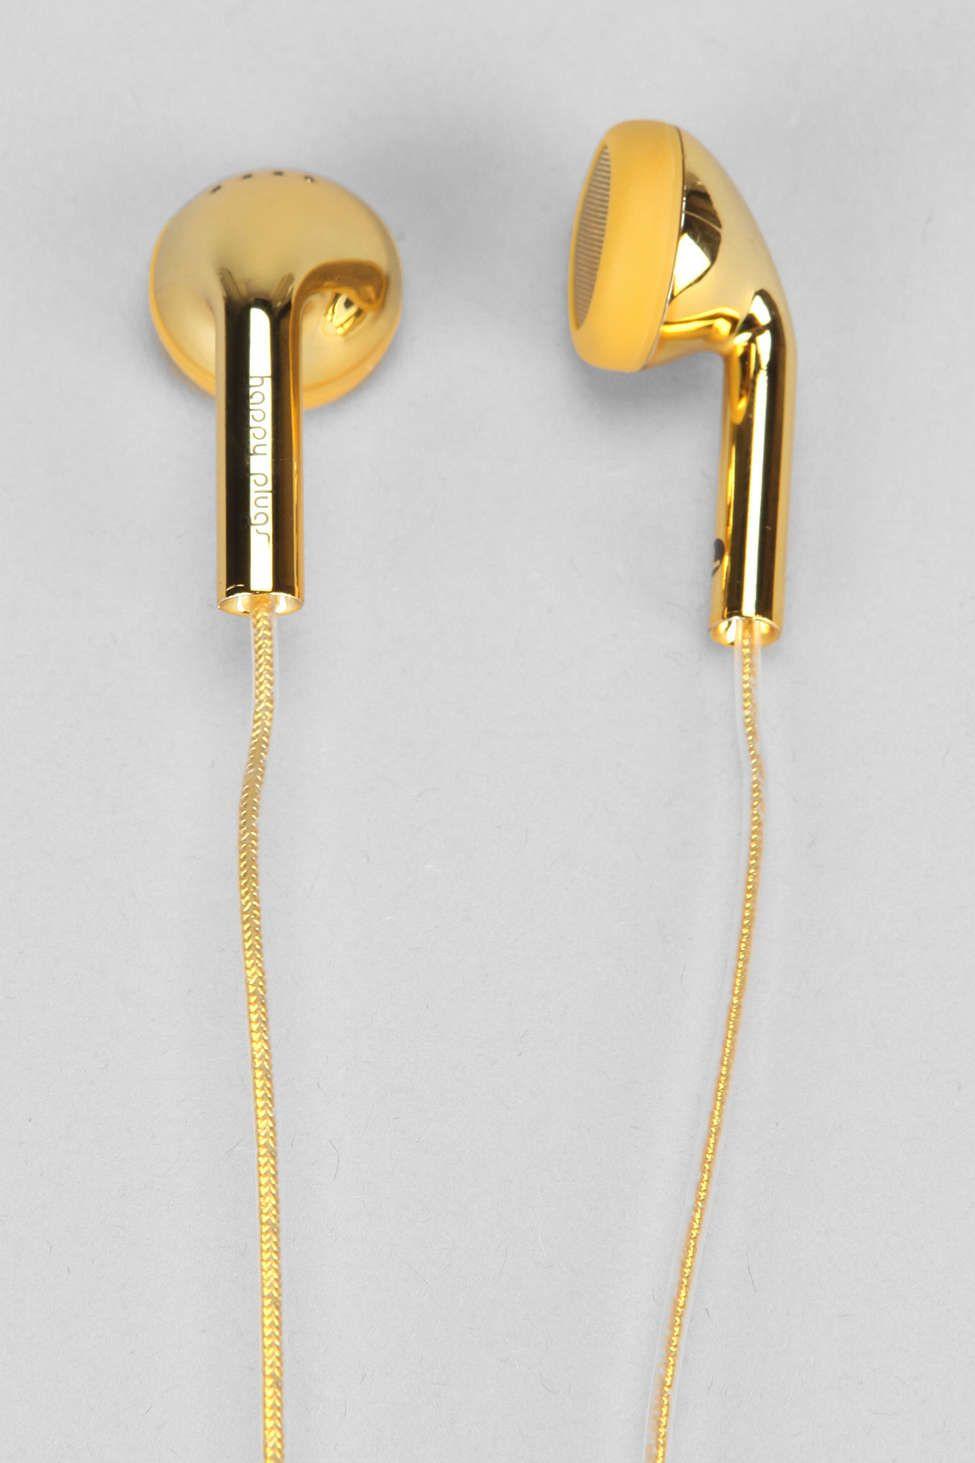 Happy Plugs Earbud Headphones Earbuds Tech Accessories Earbud Headphones